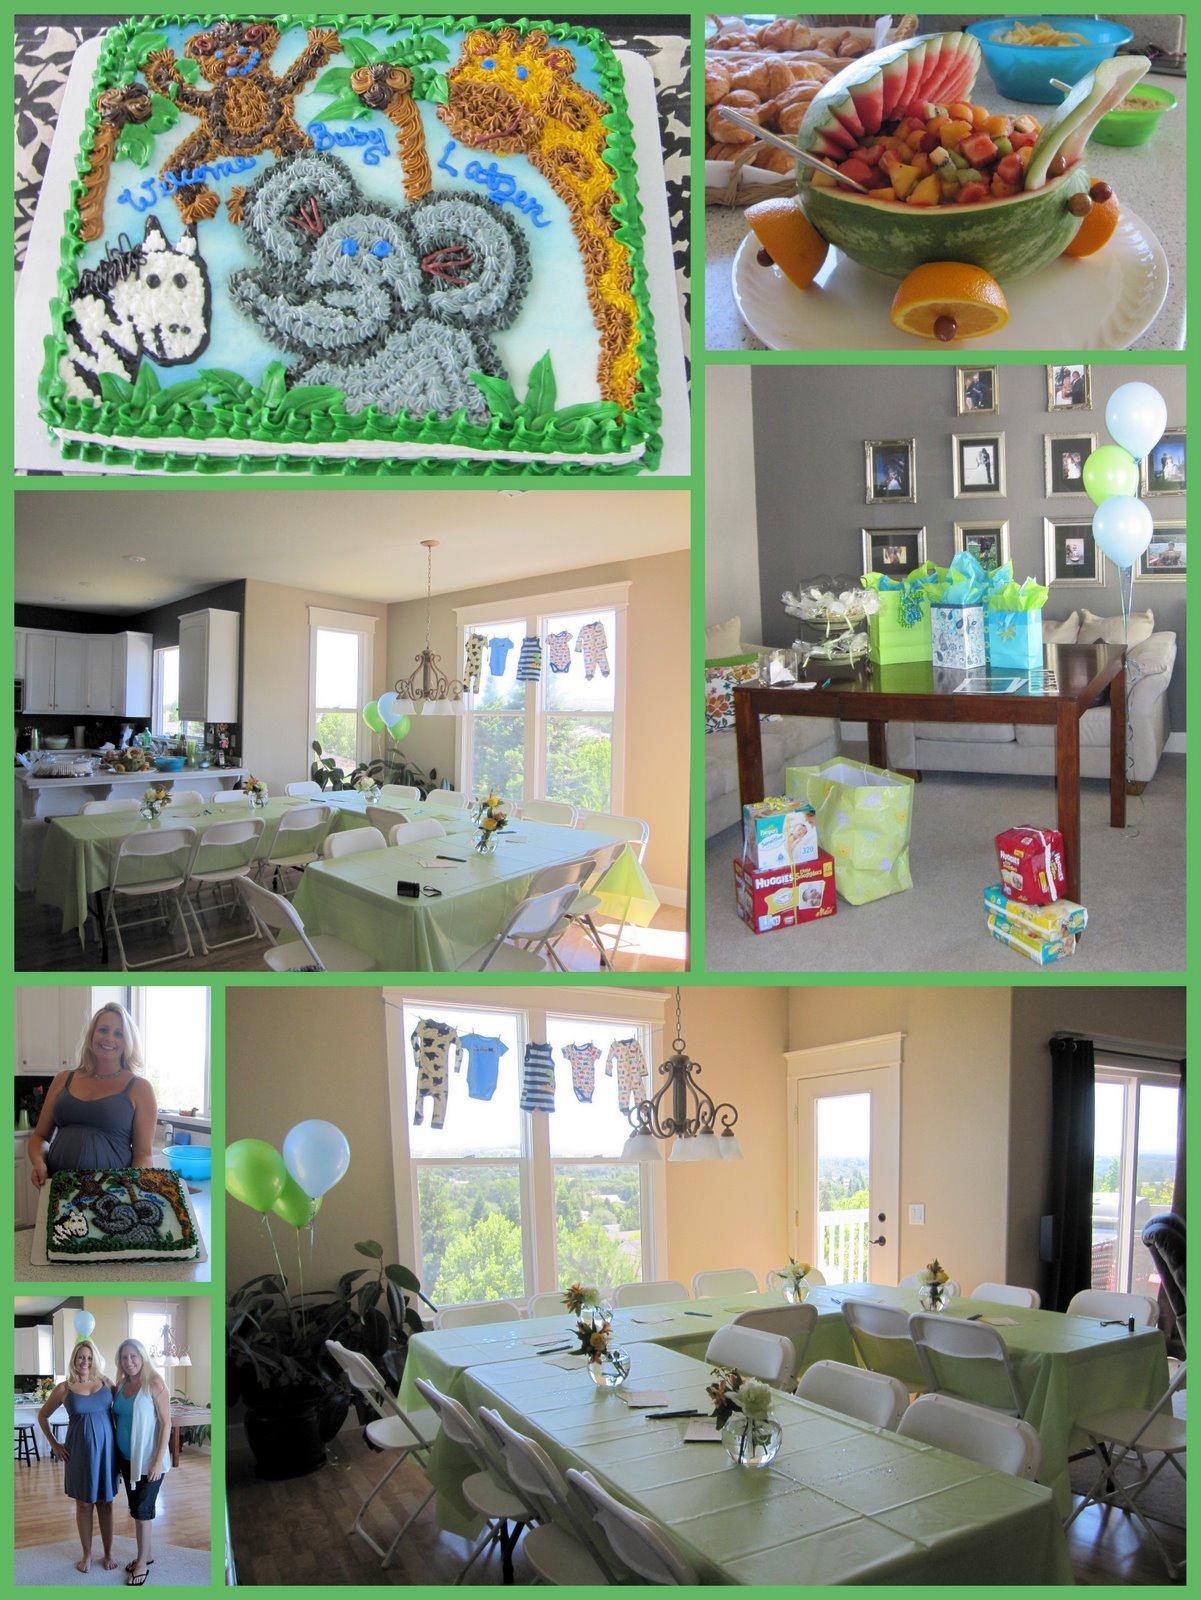 10 Spectacular Safari Jungle Baby Shower Ideas photo jungle theme baby shower ideas image 1 2021